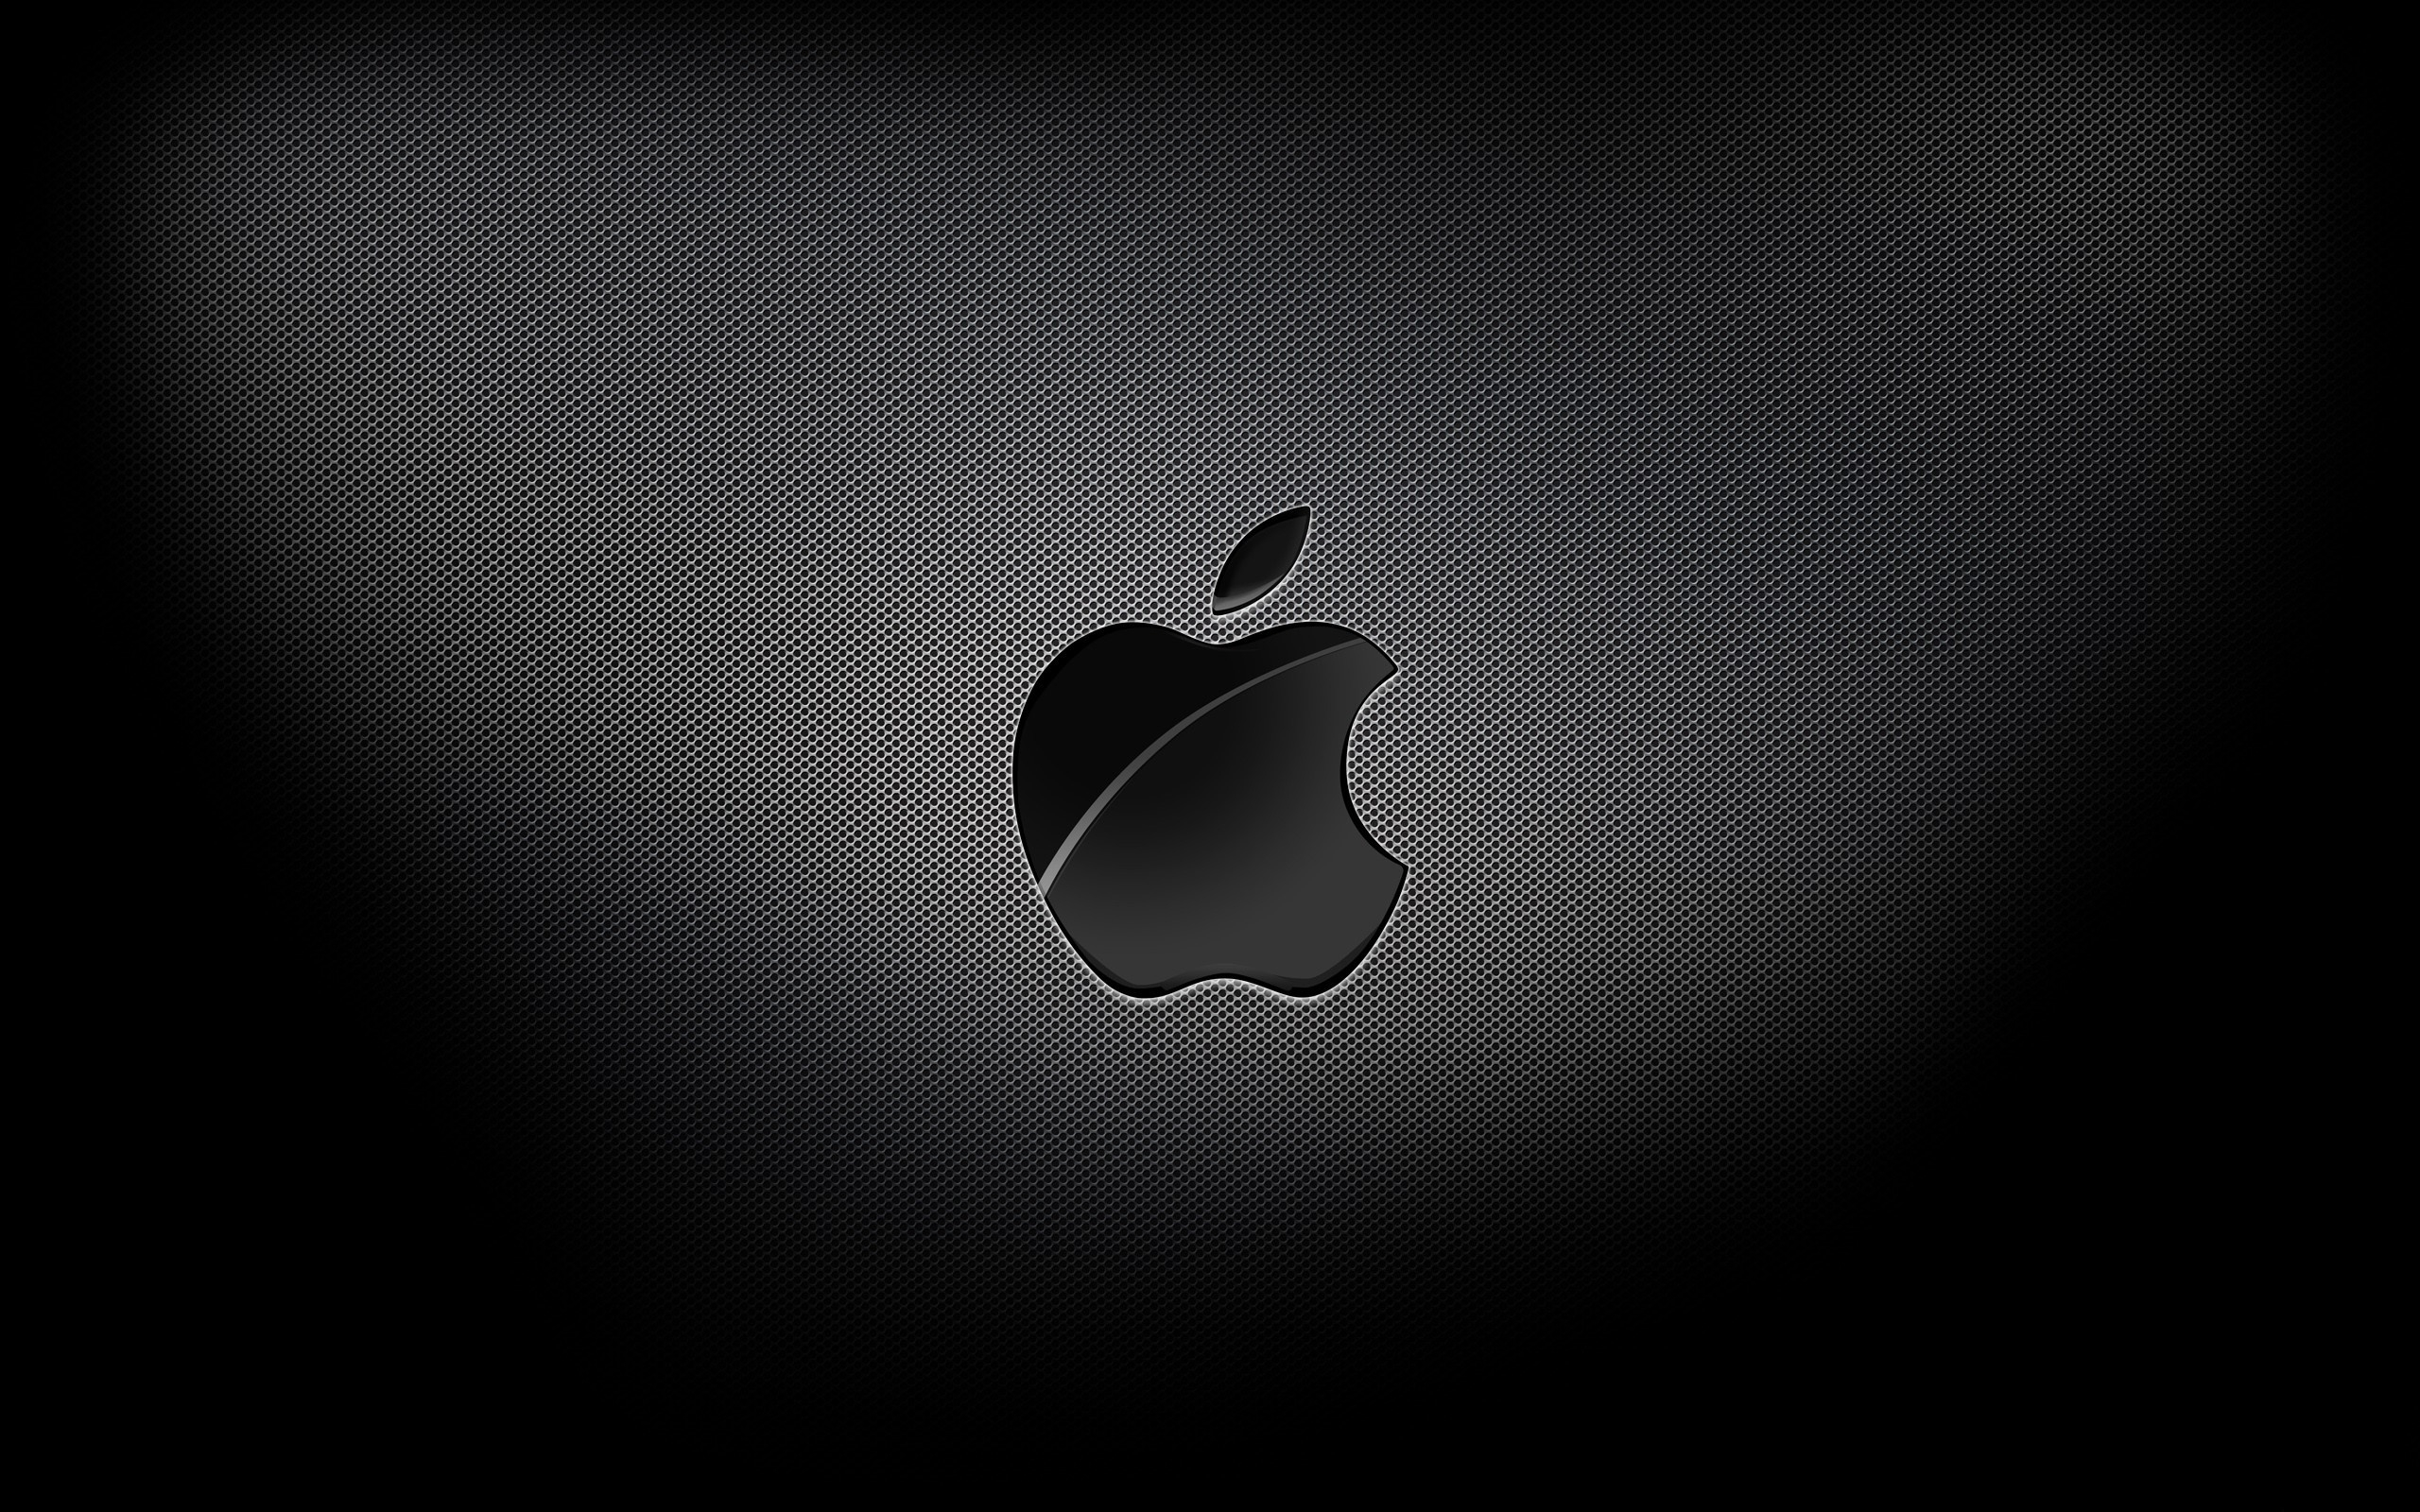 logo Mac Wallpapers iMac Wallpapers Retina MacBook Pro 2560x1600